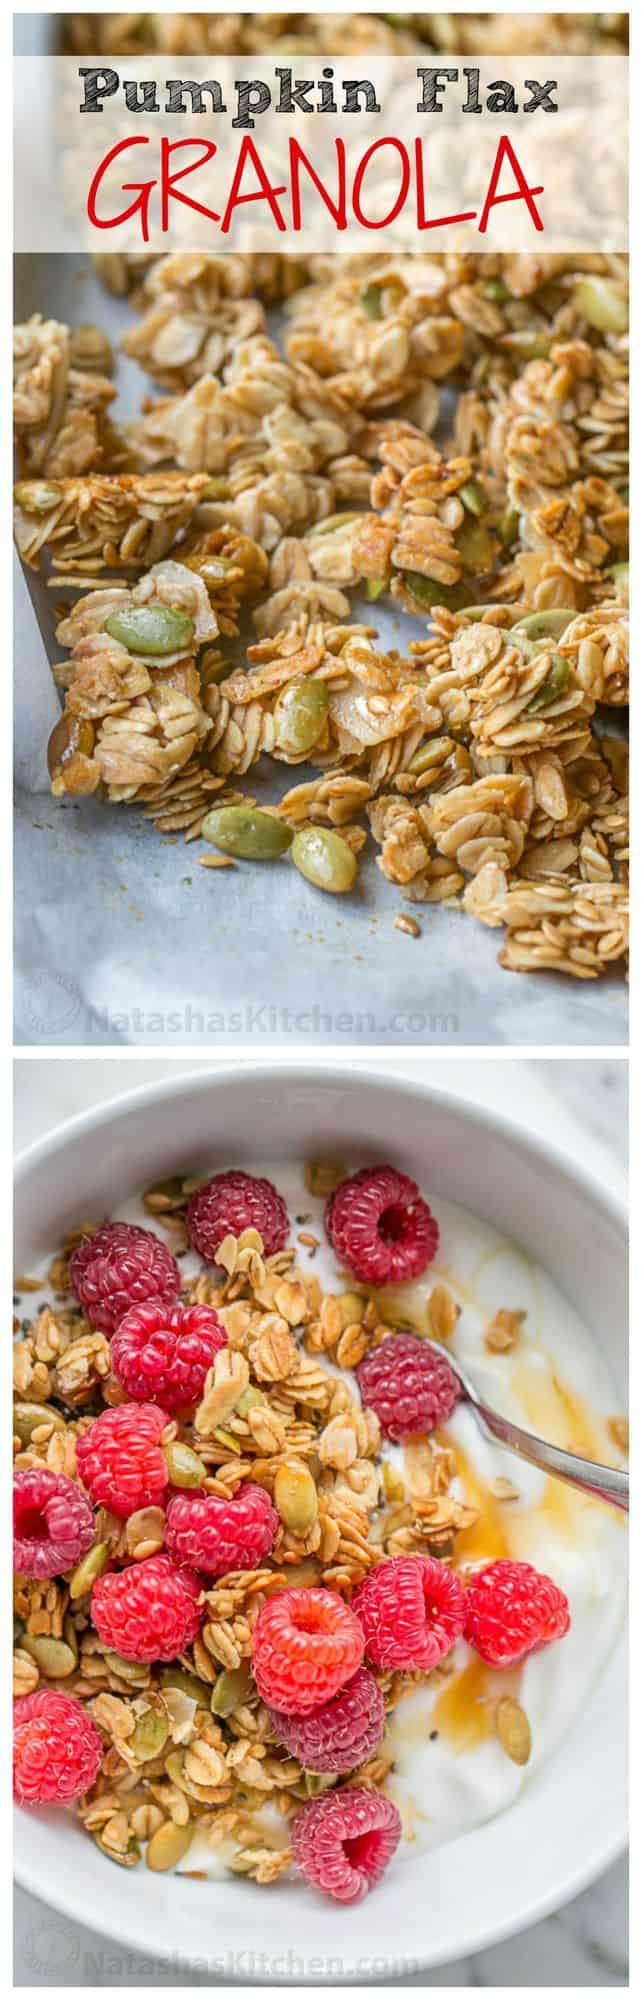 Pumpkin Flax Granola Recipe - crunchy, clustery and sweetened with honey | natashaskitchen.com